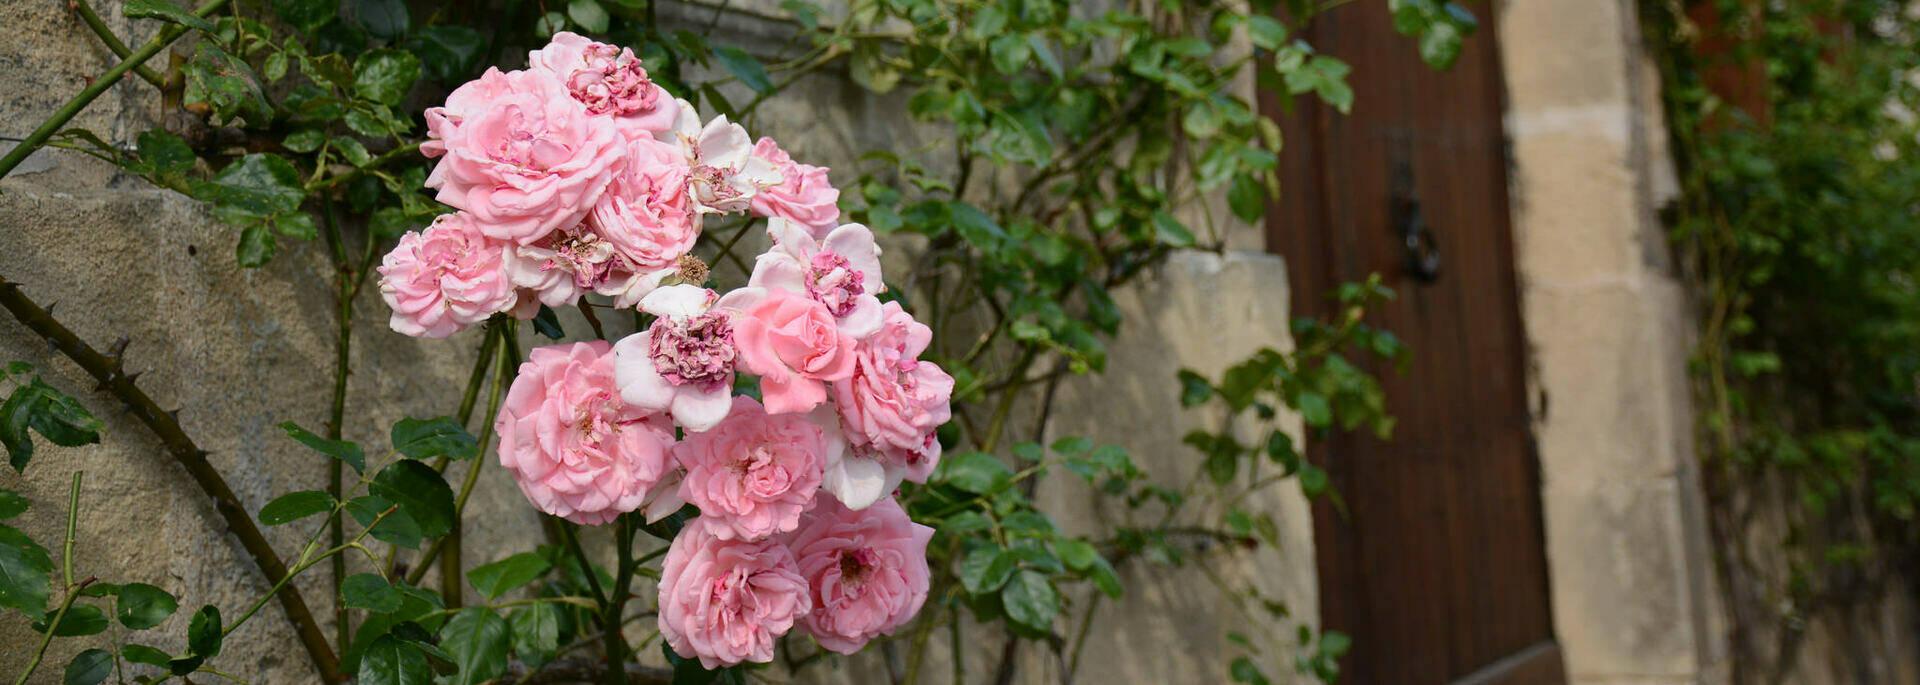 Rue médiévale fleurie